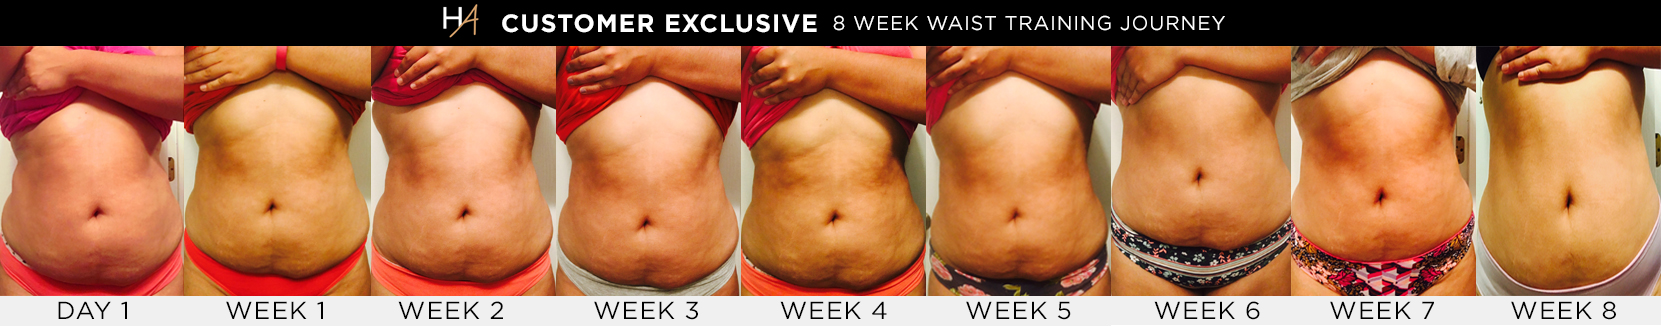 8-Week Waist Training Journey